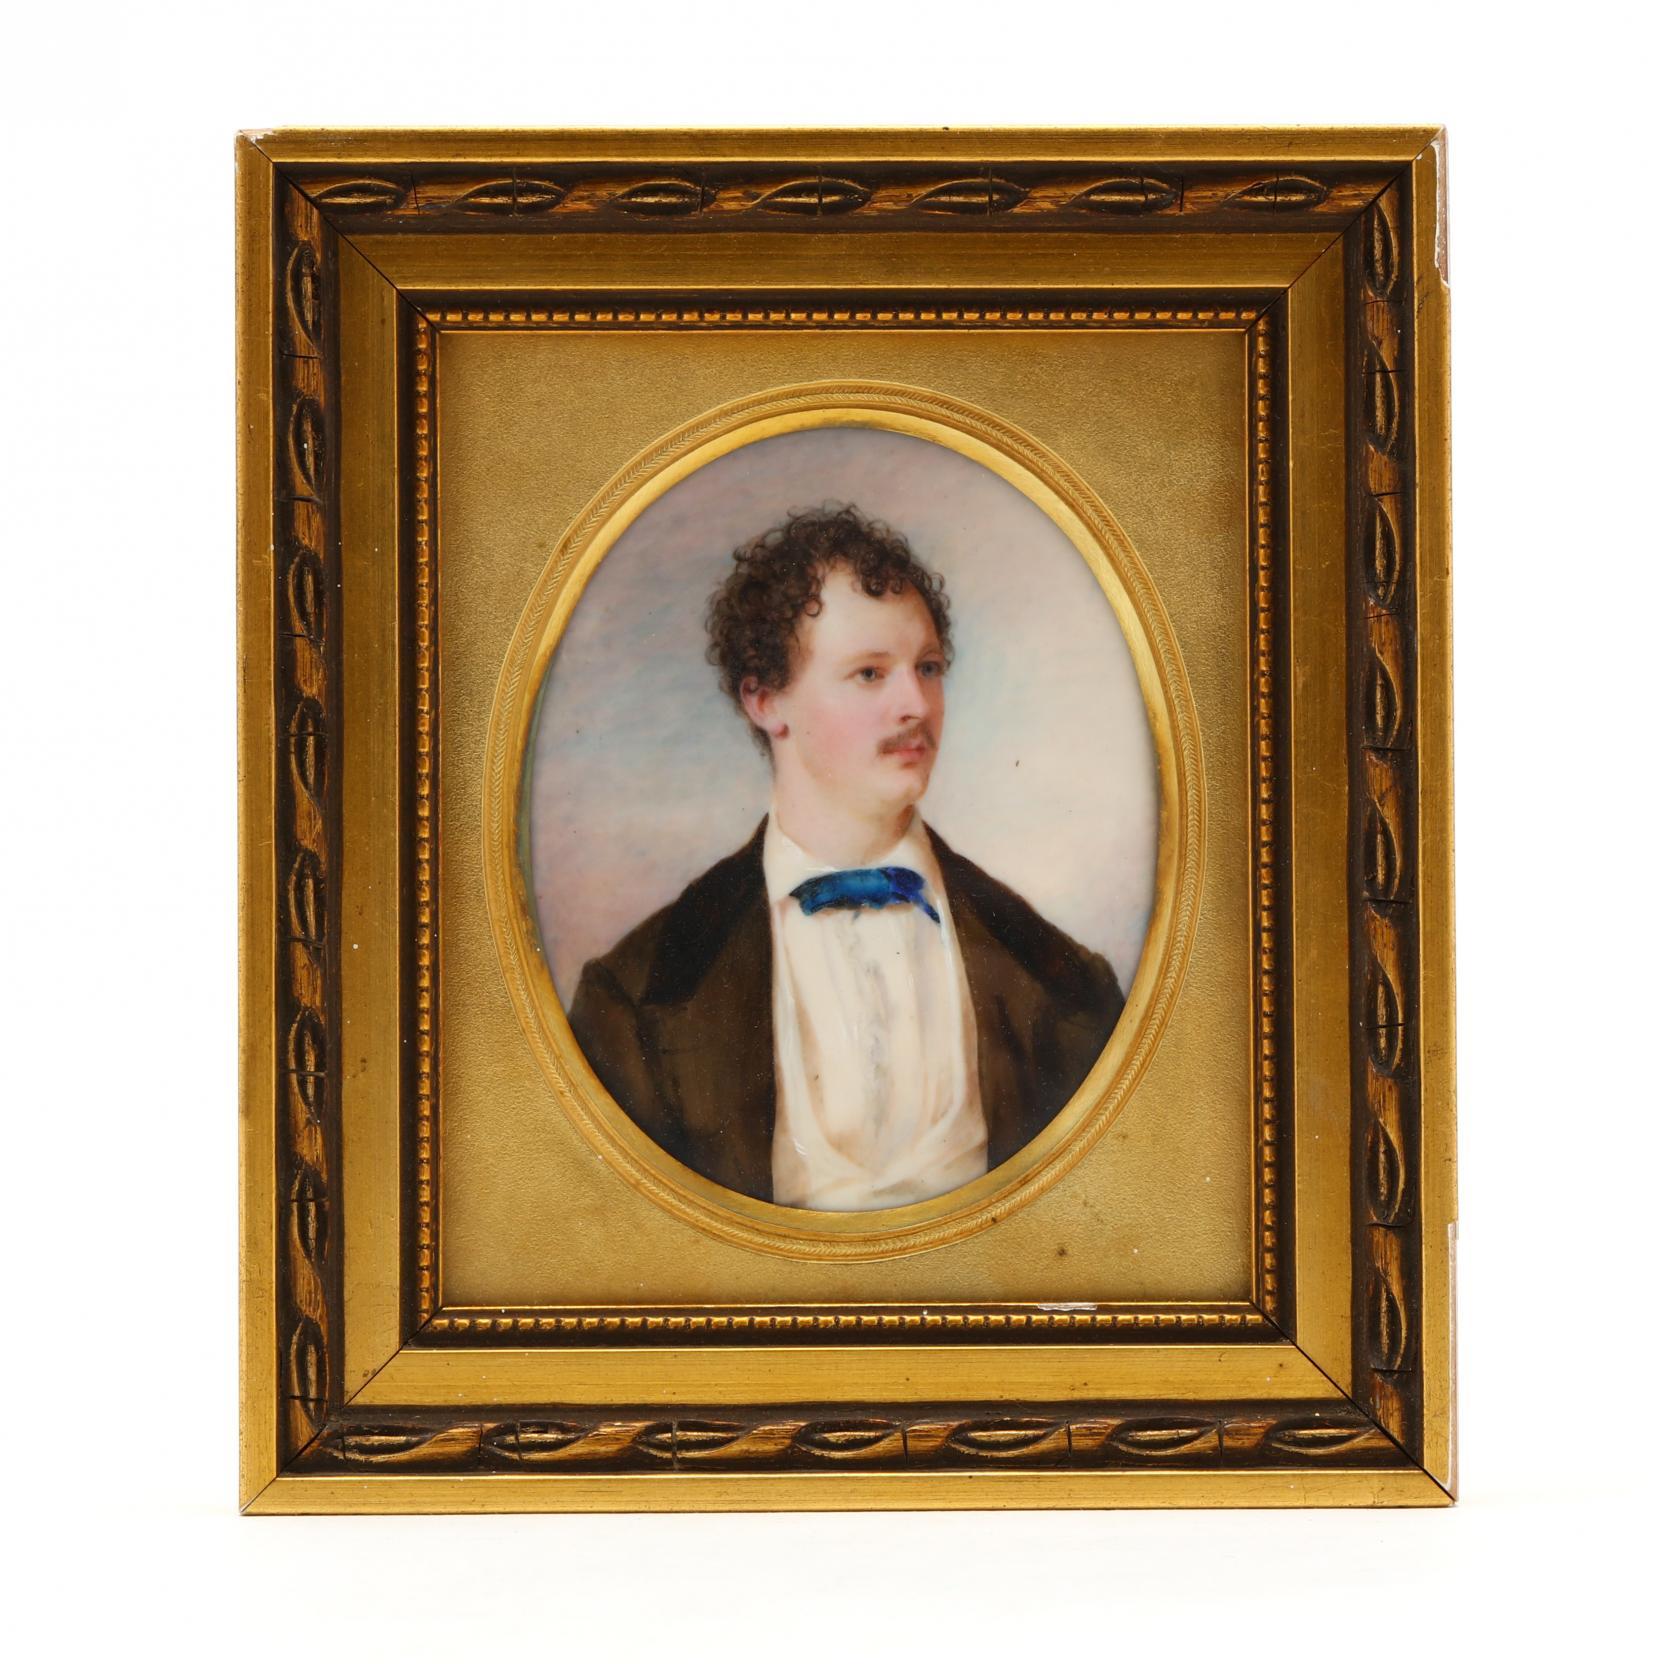 att-george-lethbridge-saunders-british-1807-1863-portrait-miniature-of-harry-dorsey-gough-carroll-sargent